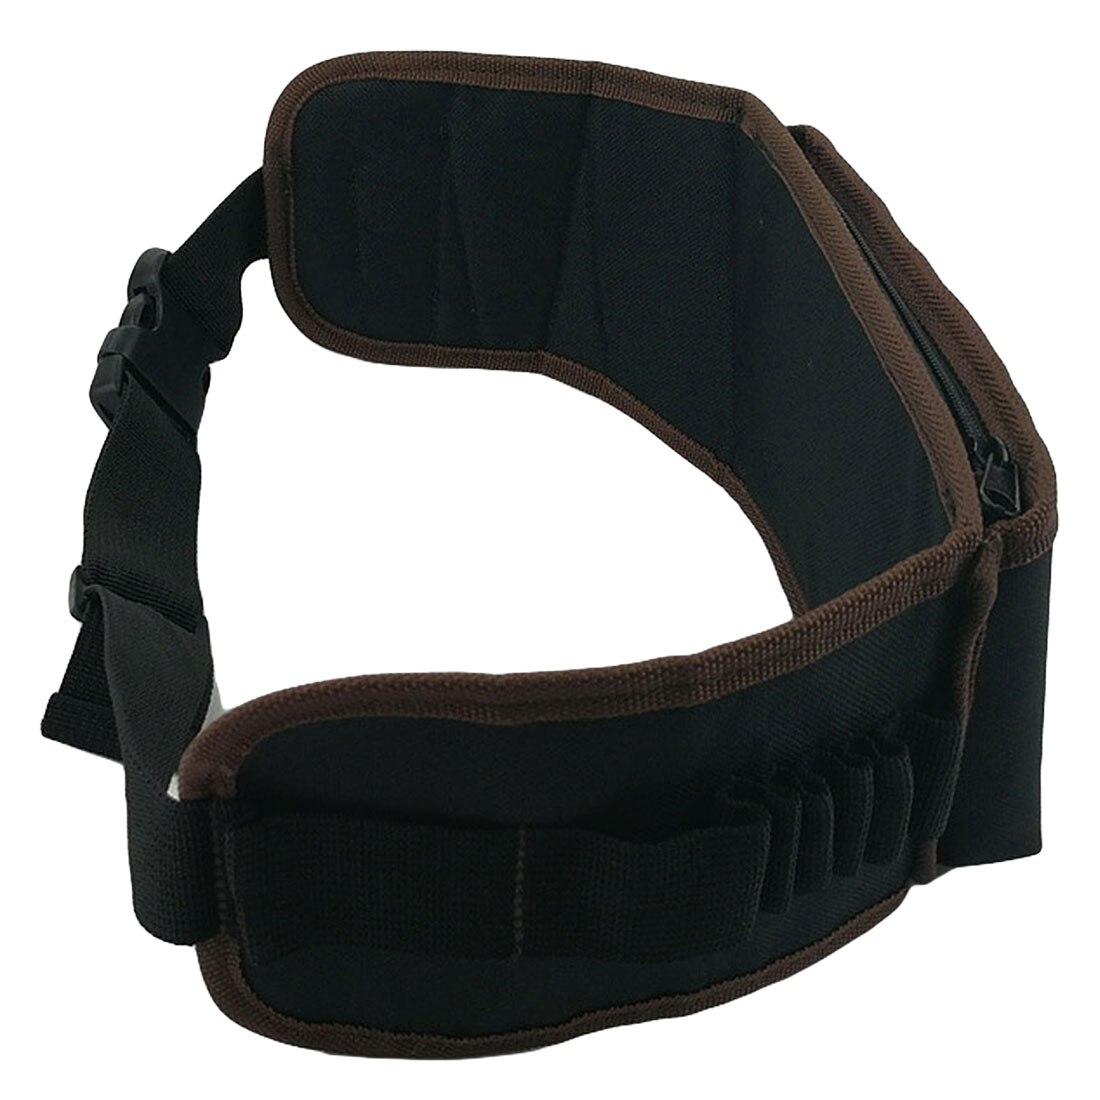 Hardware Mechanic Canvas Bag Multifunctional Pouch Holder Belt Waist Packs Work Tool Bag